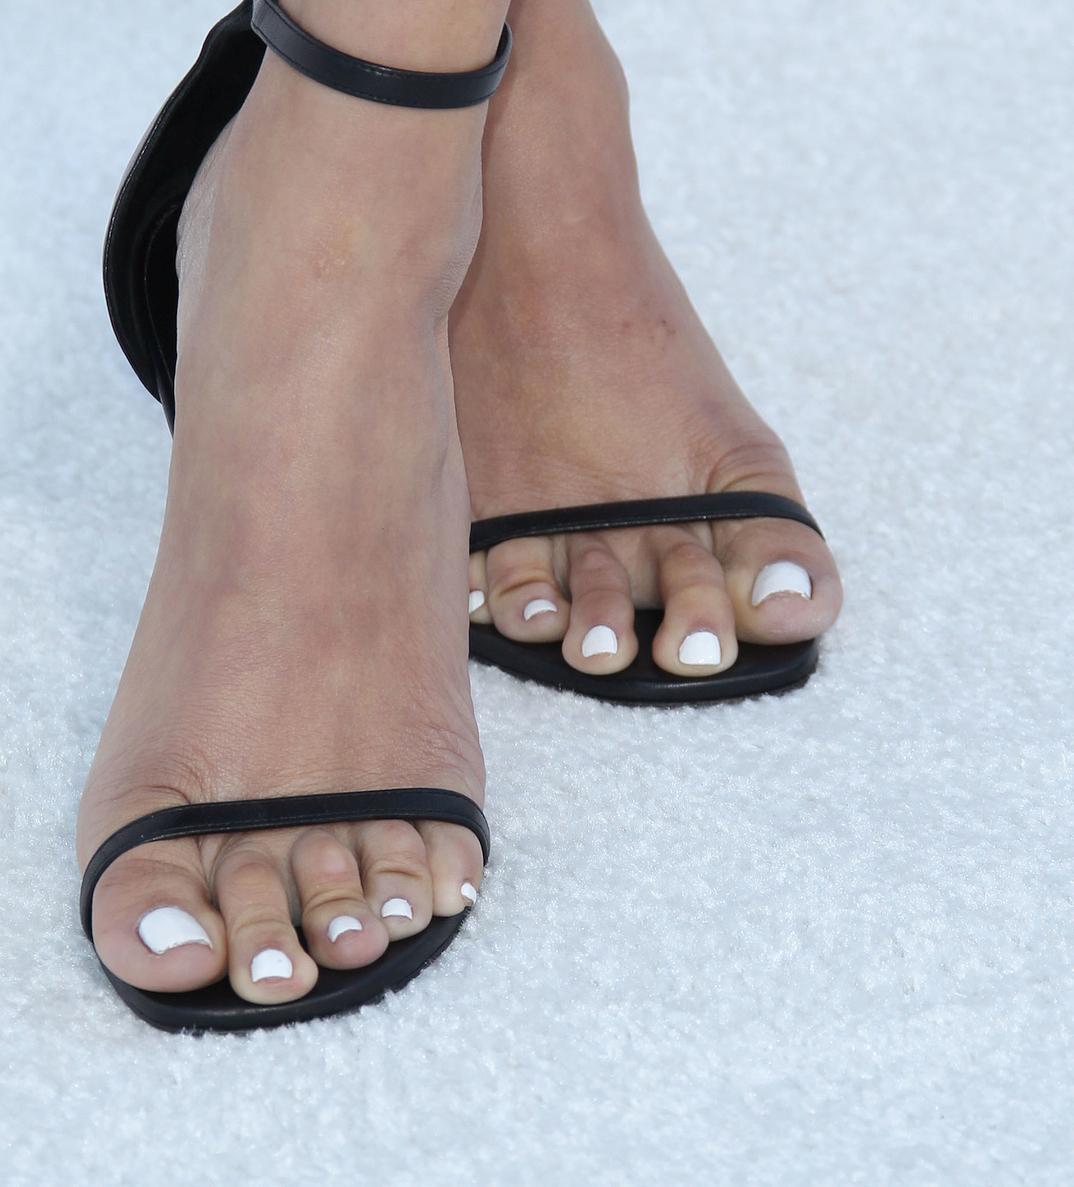 Draya Michele's feet